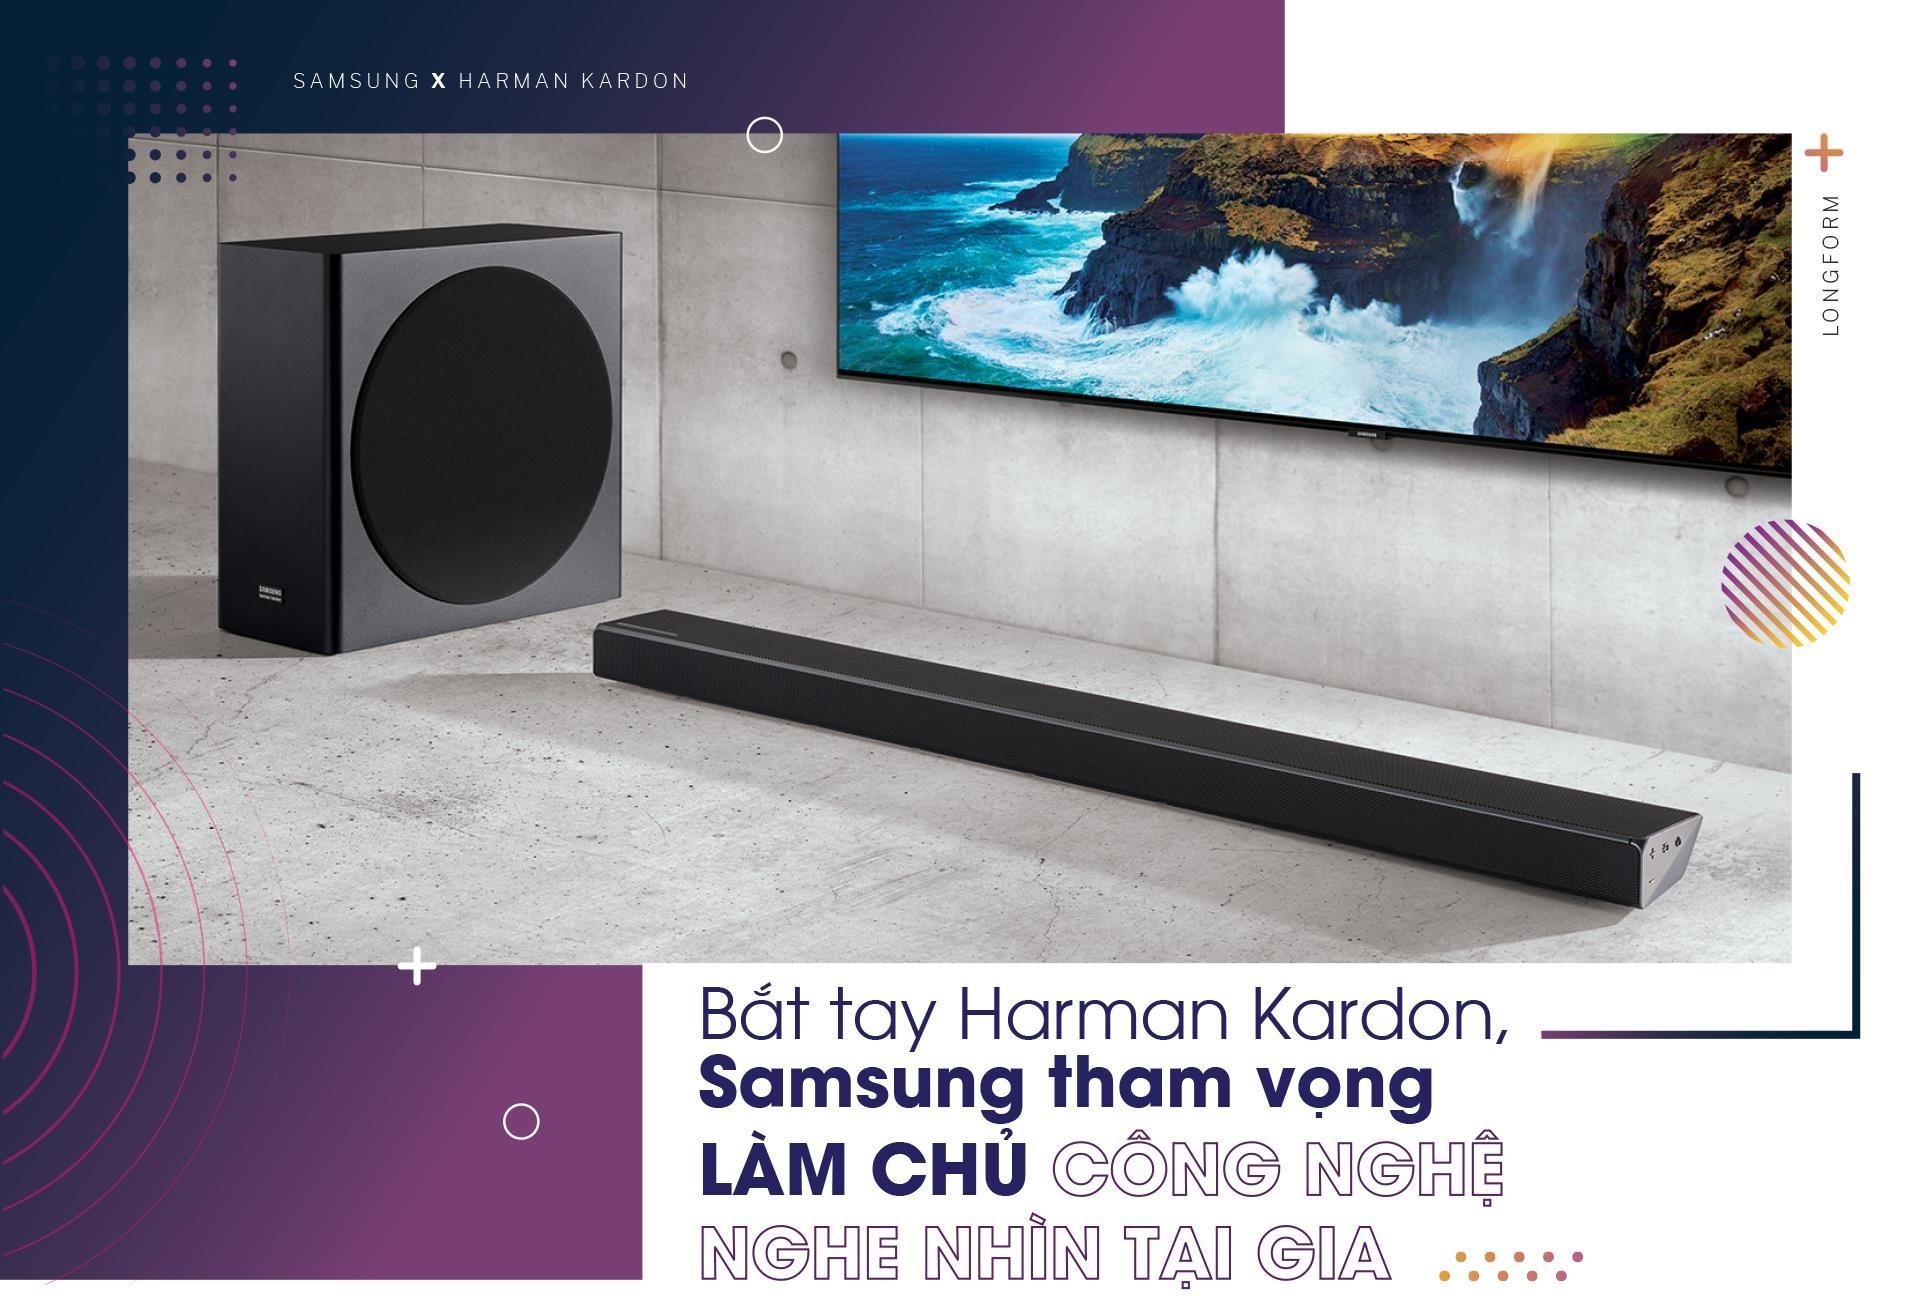 Bat tay Harman Kardon, Samsung tham vong lam chu cong nghe nghe nhin hinh anh 2